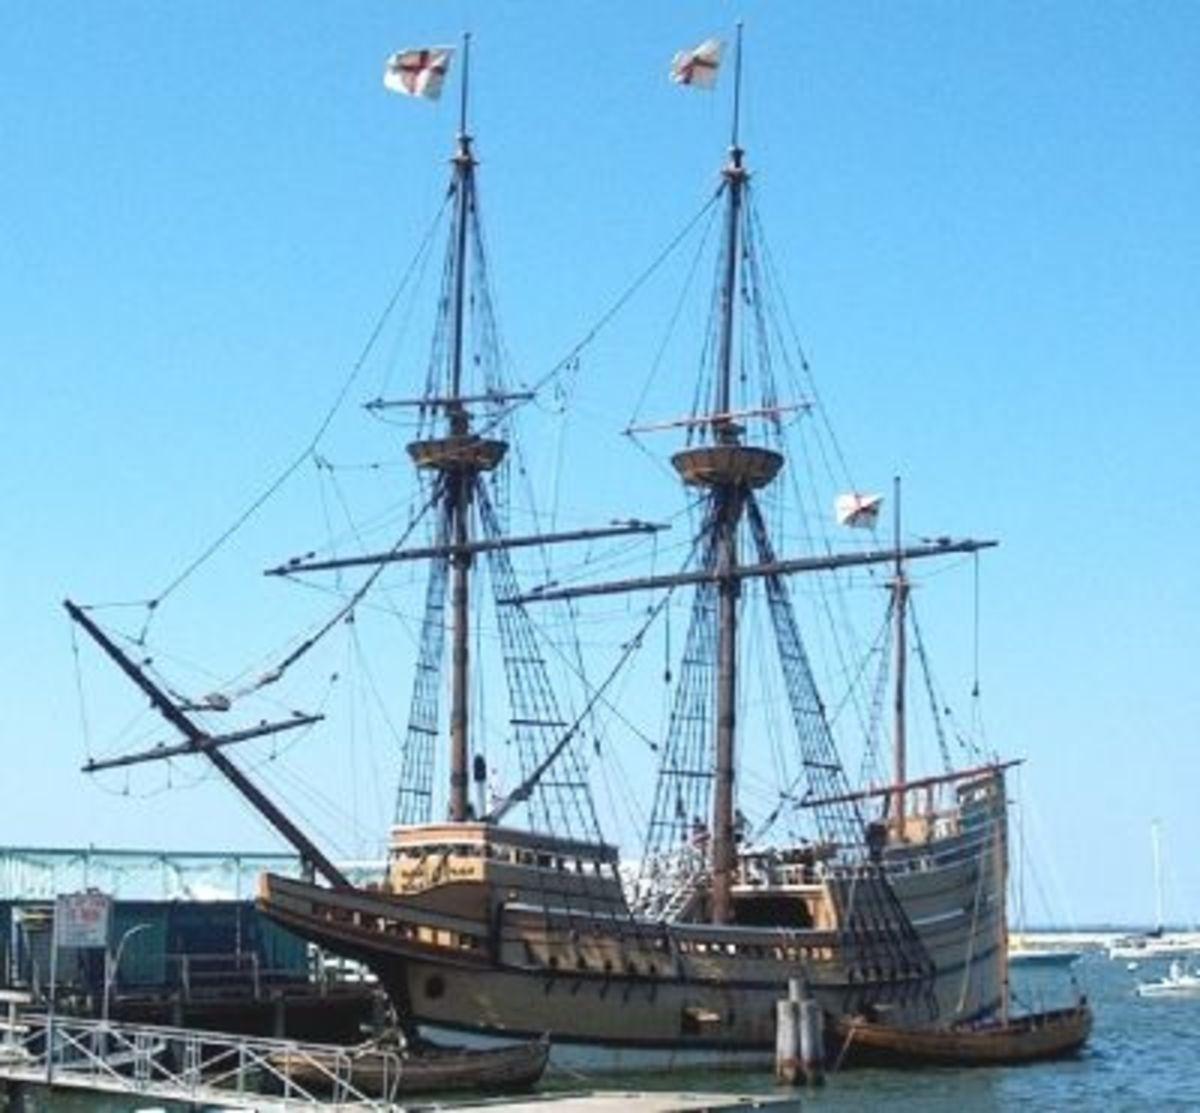 The Mayflower II in Plymouth Harbor, Massachusetts